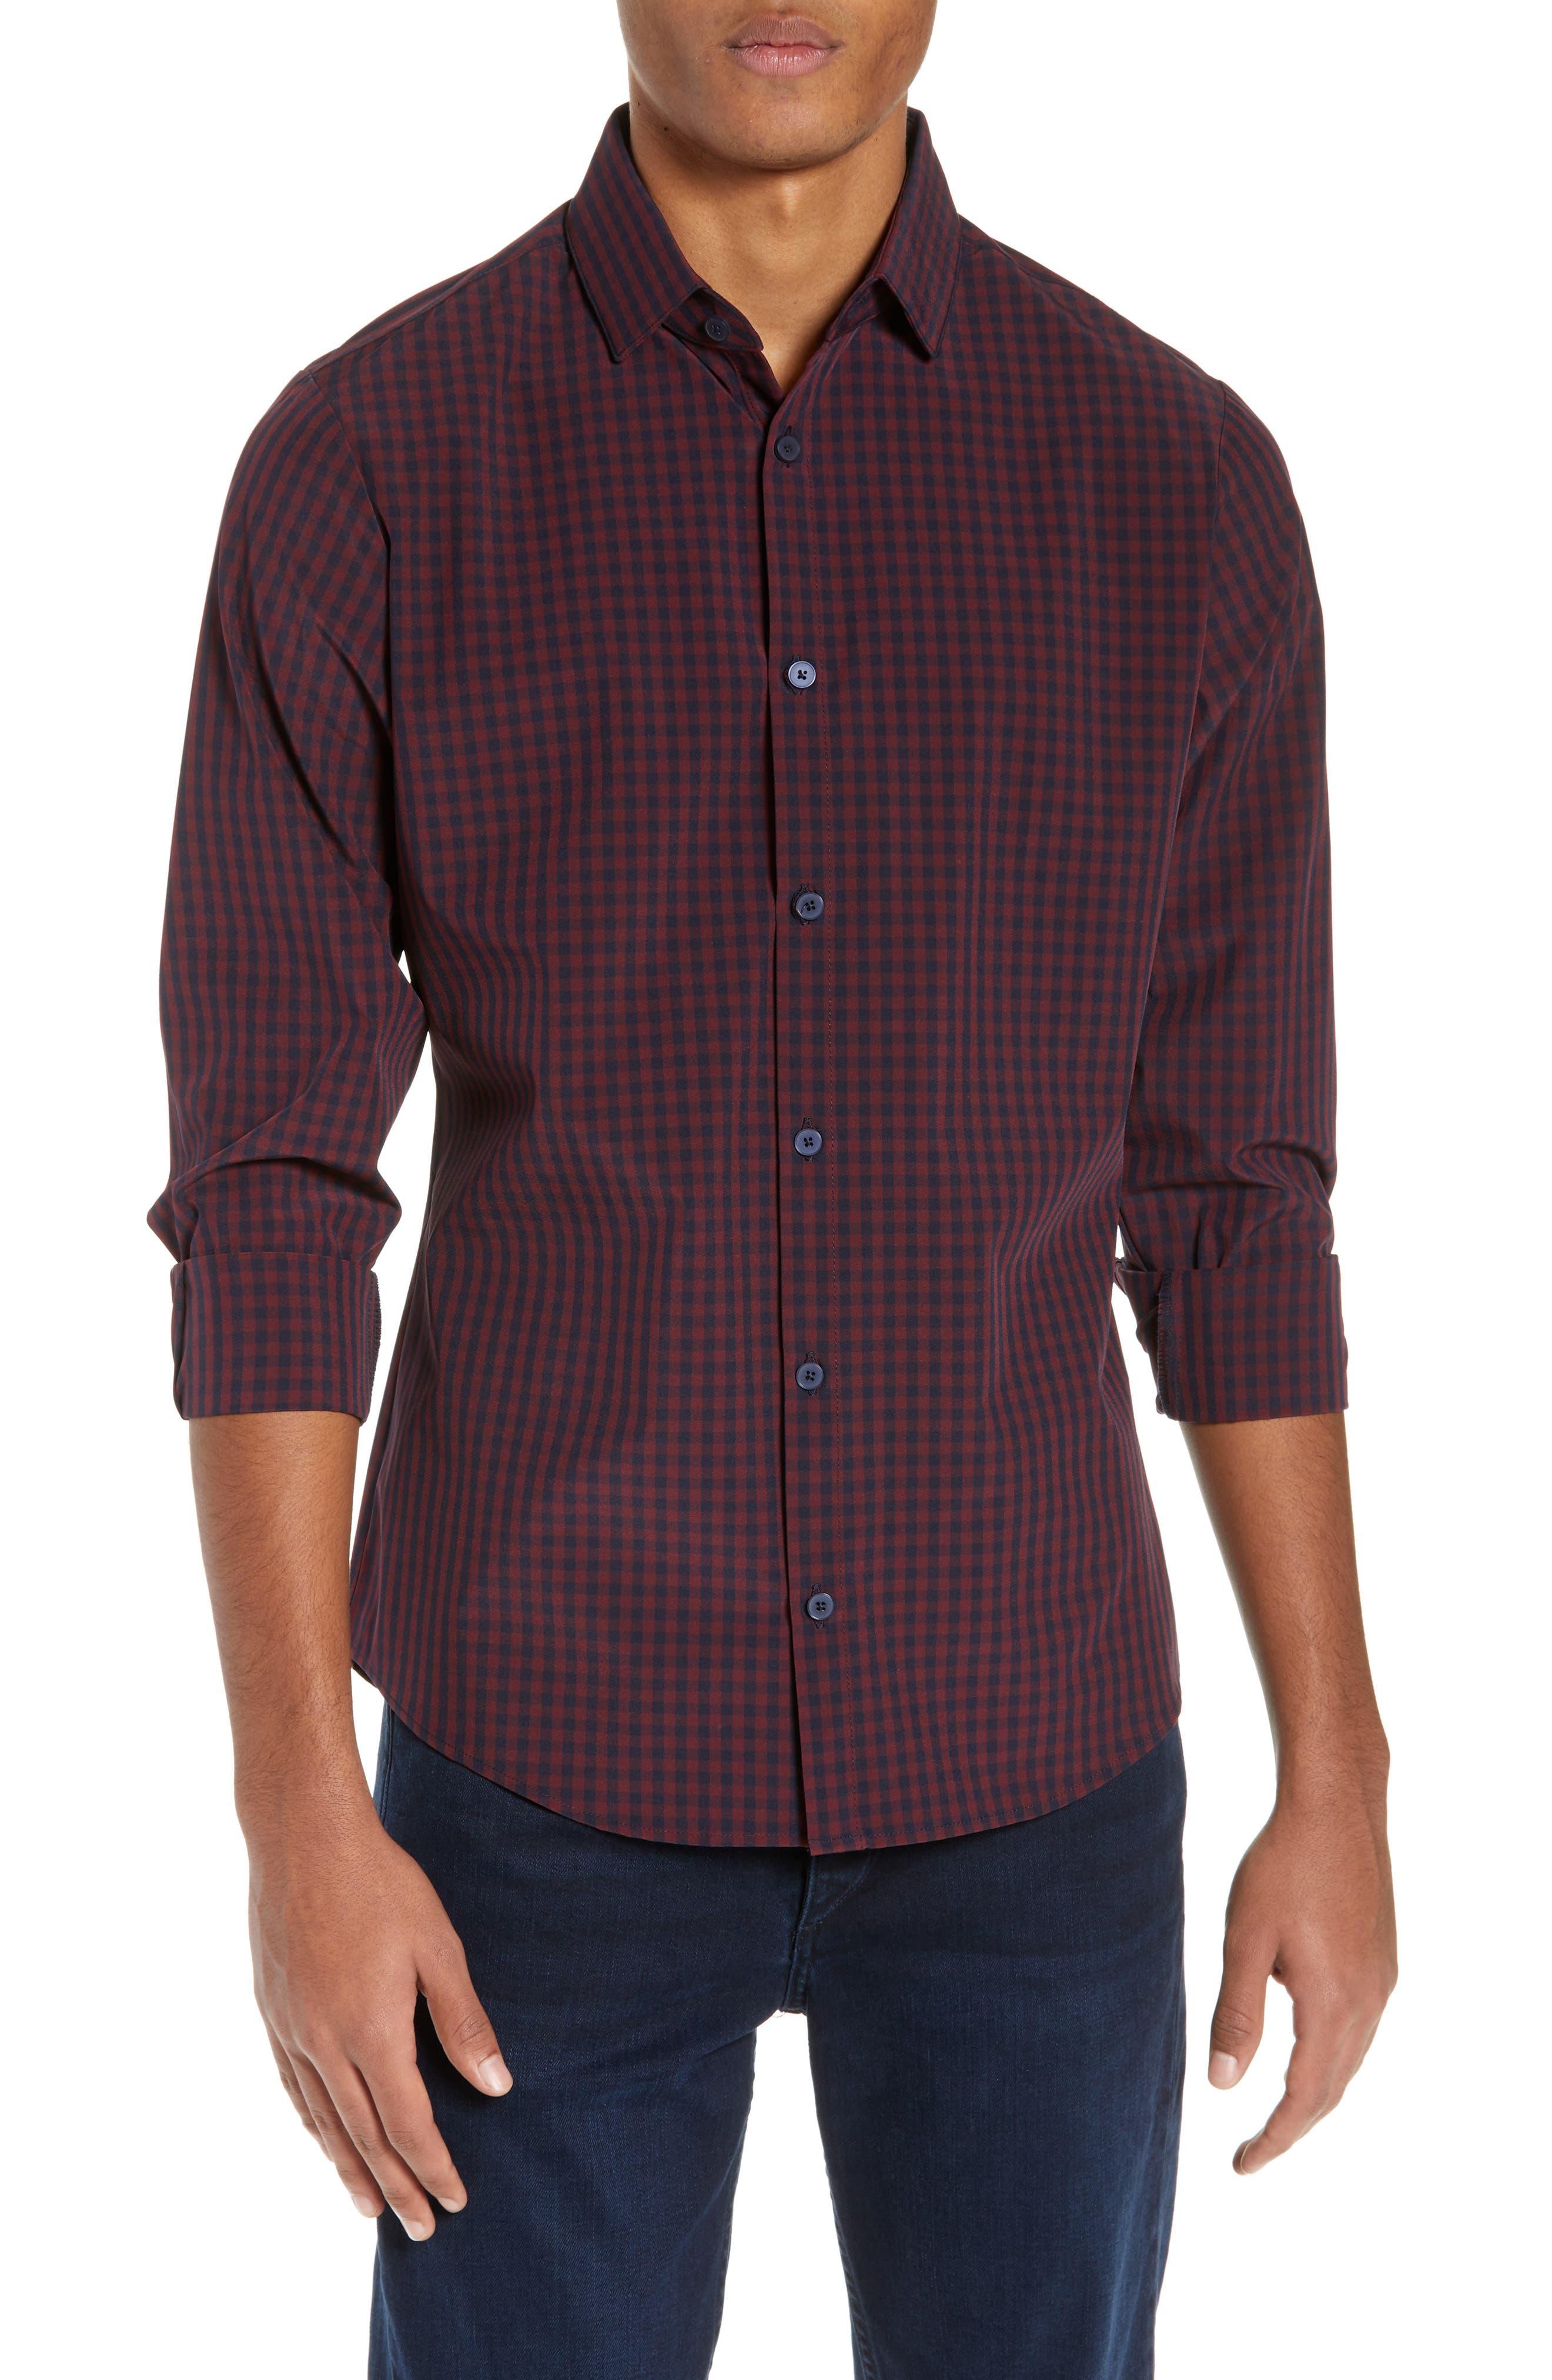 MIZZEN+MAIN Marshall Check Sport Shirt, Main, color, 930